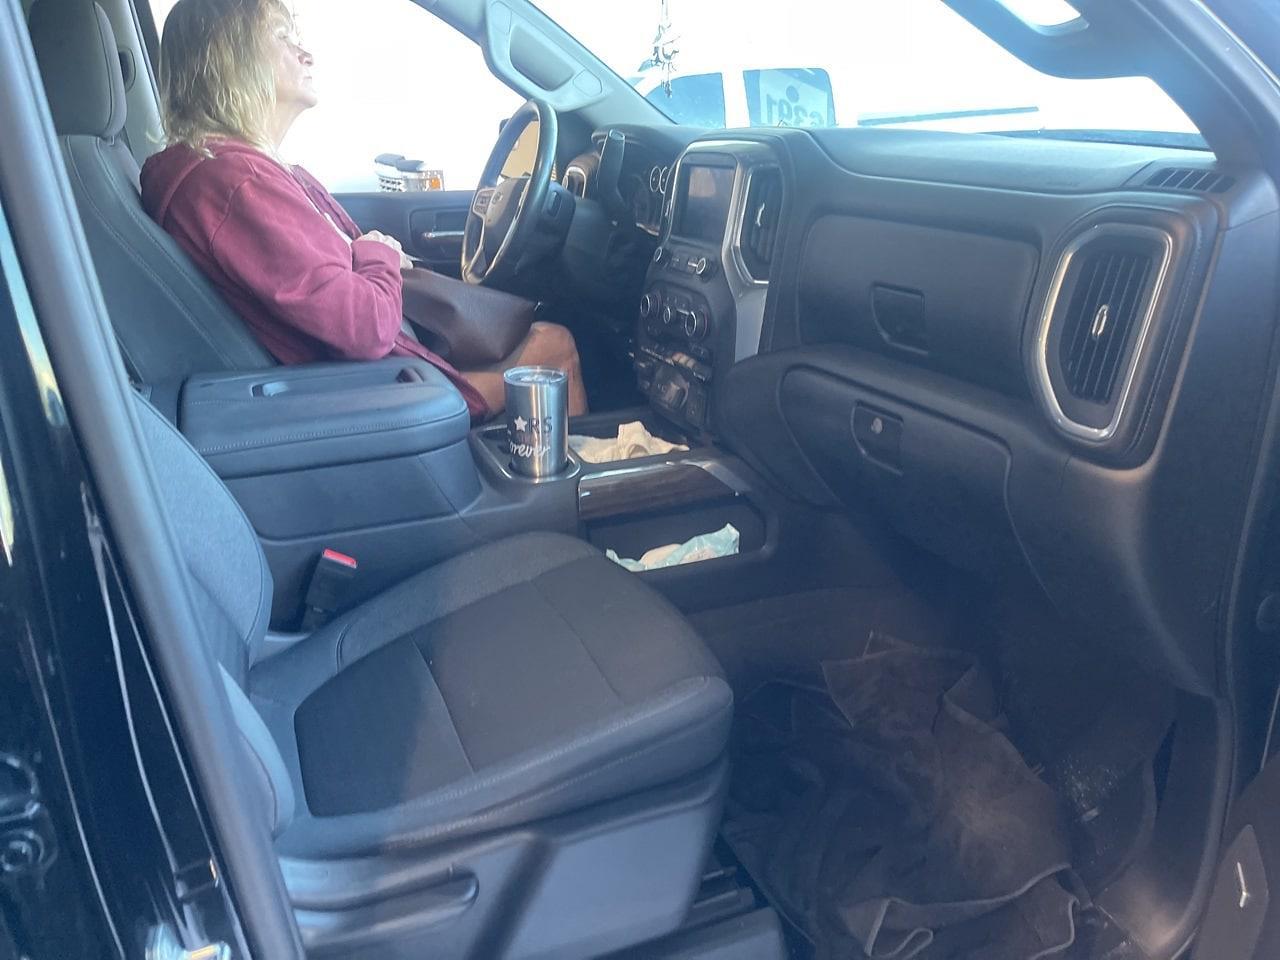 2019 Silverado 1500 Crew Cab 4x4, Pickup #P6529 - photo 18